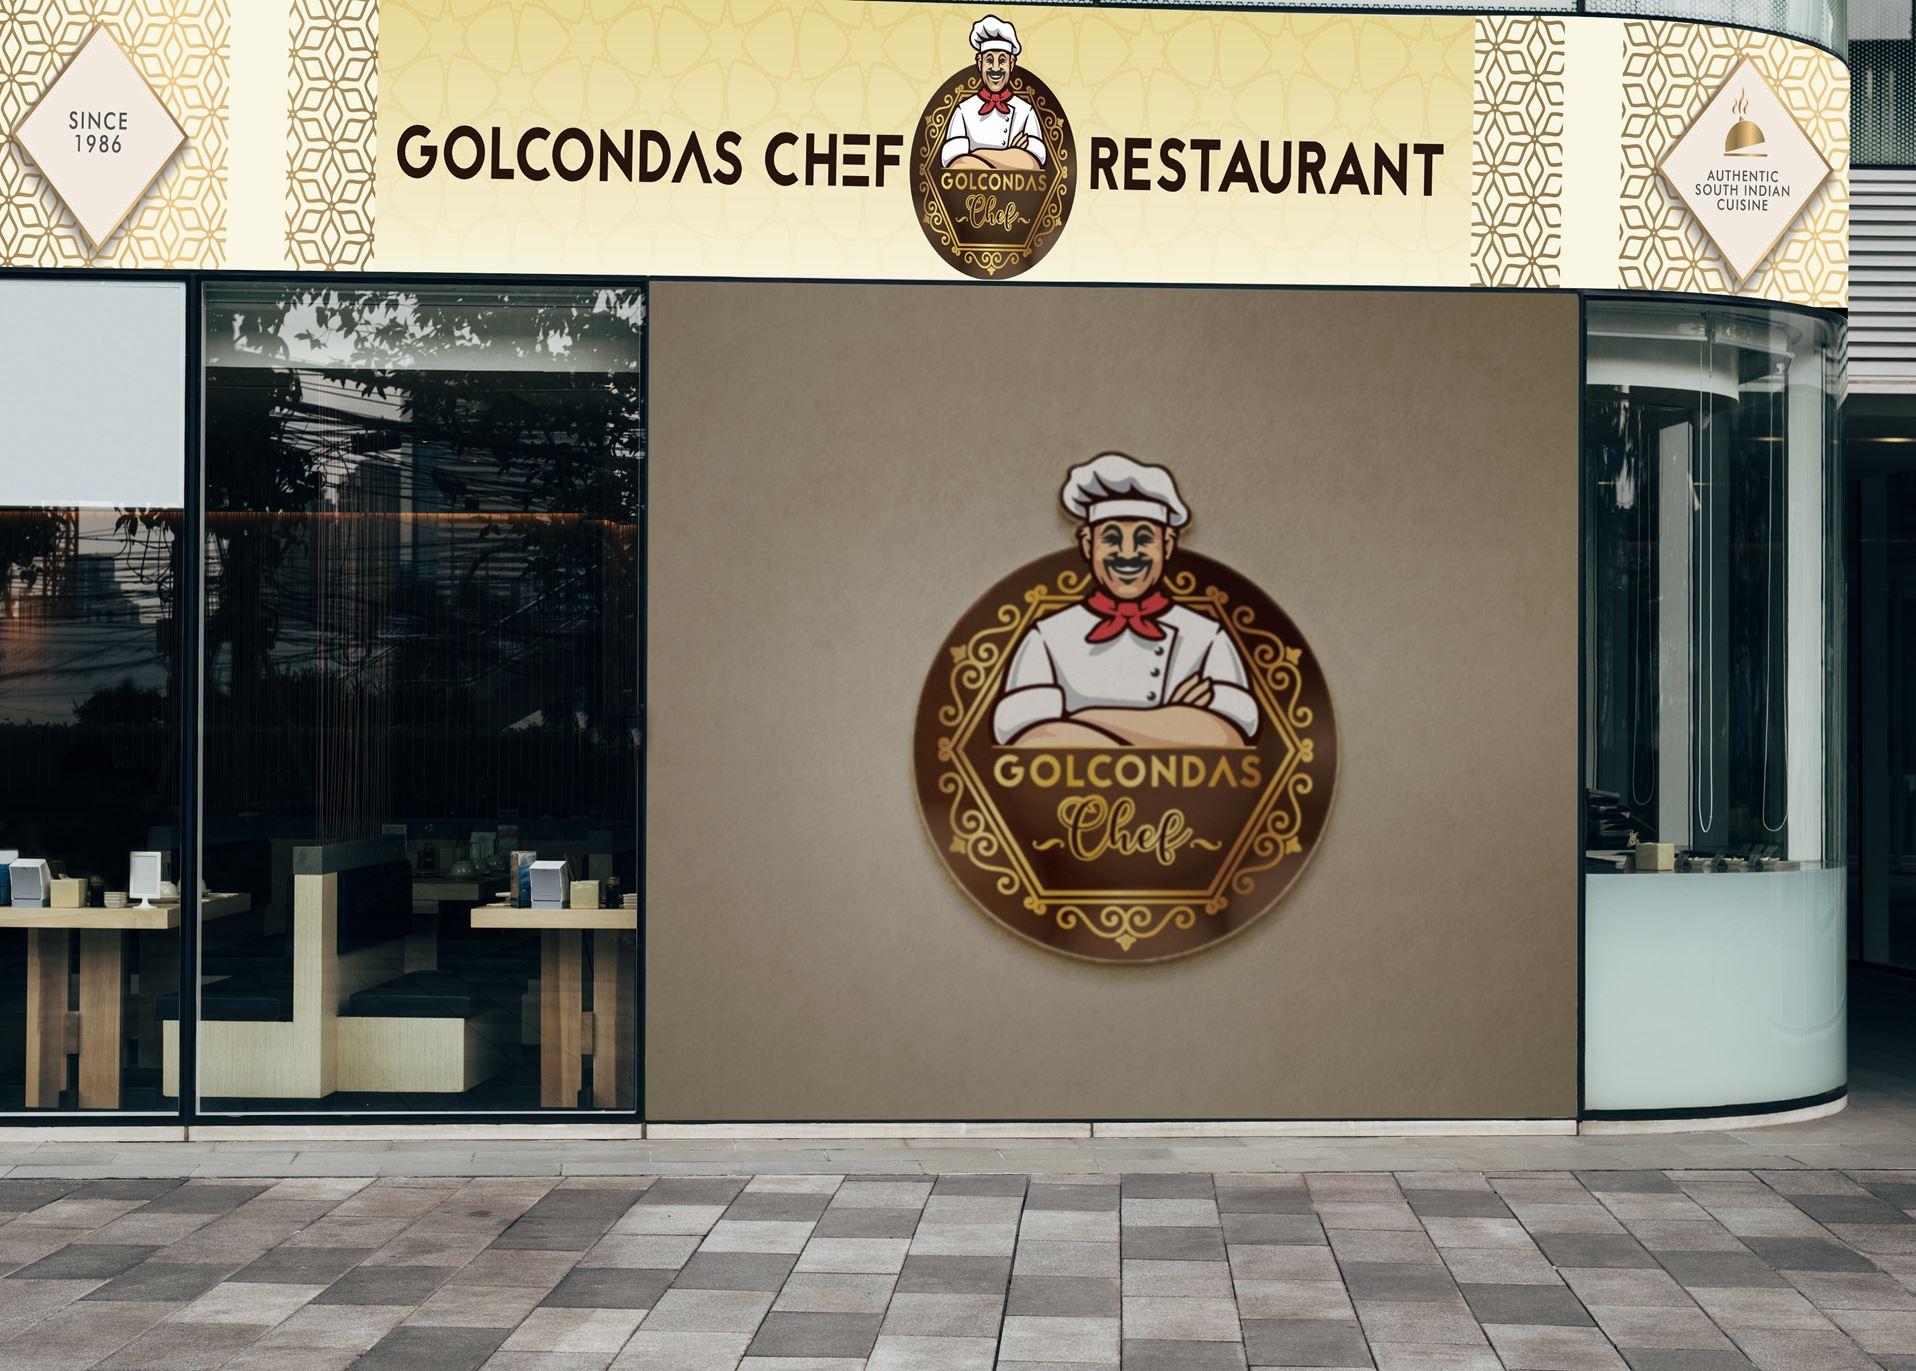 Mockup of a restaurant wall signage